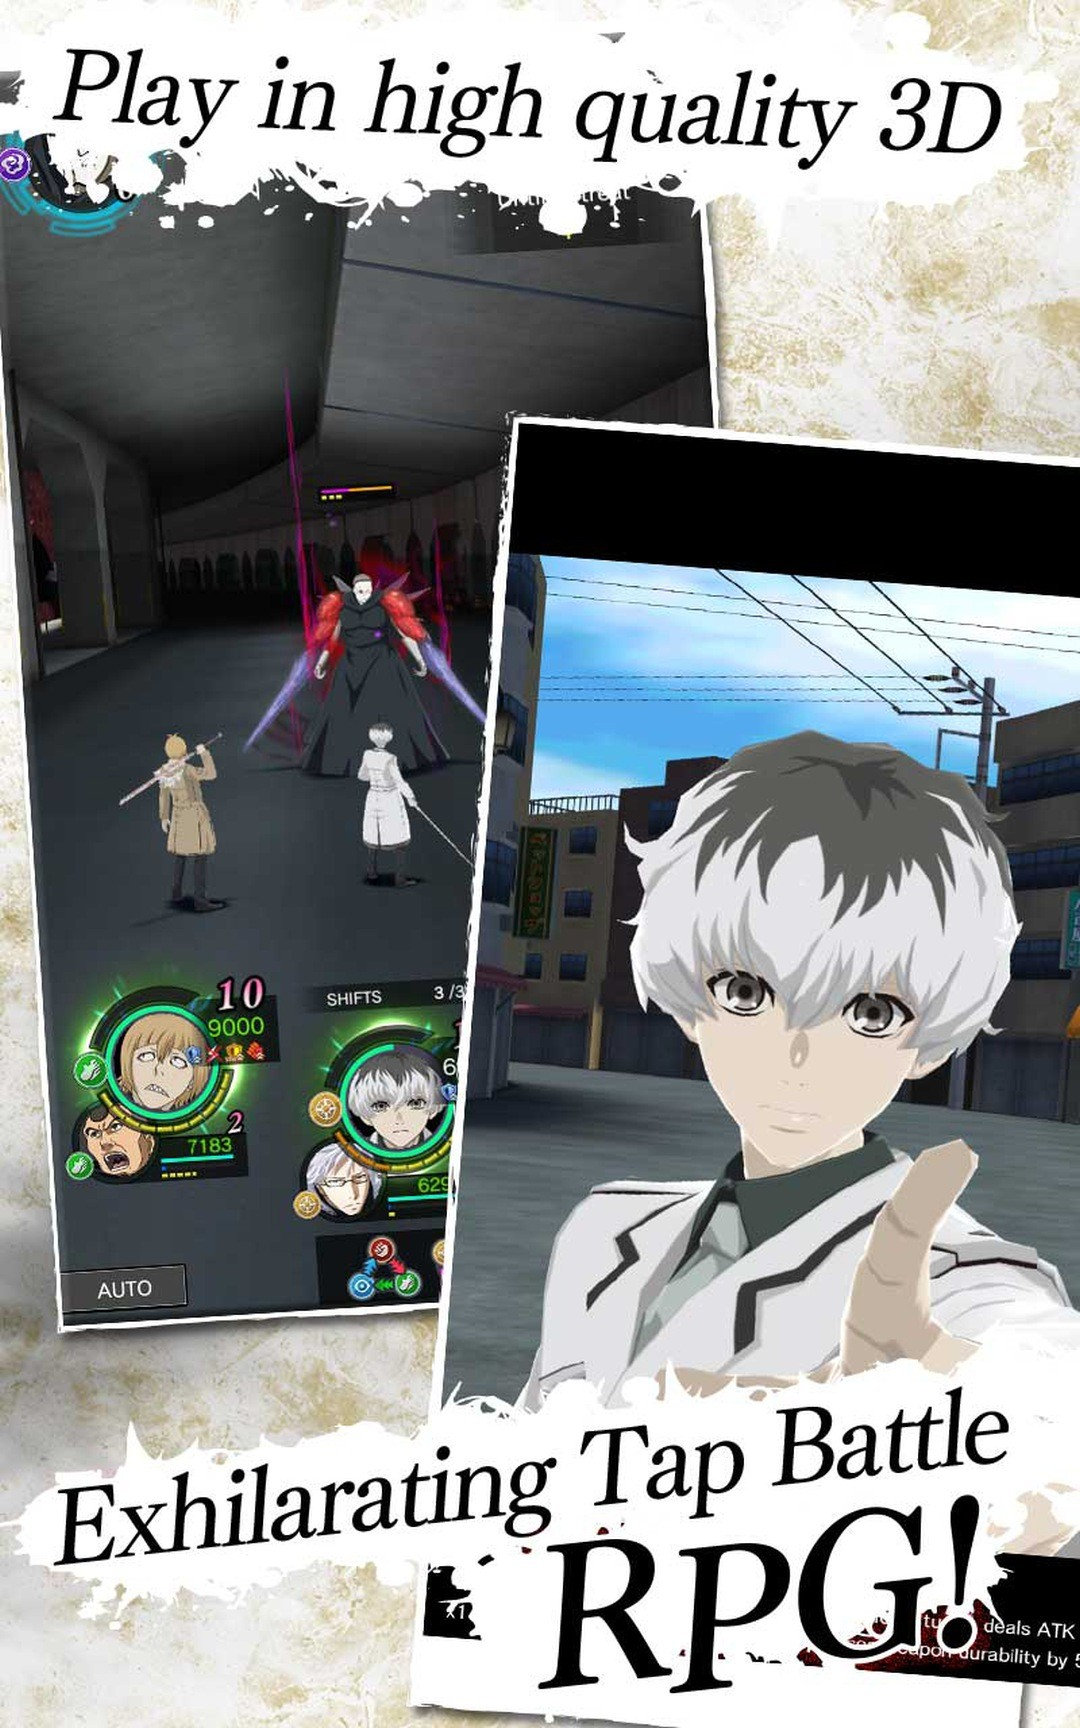 Tokyo Ghoul:re 2 Episodio 1 Streaming & Download... - AnimeWorld